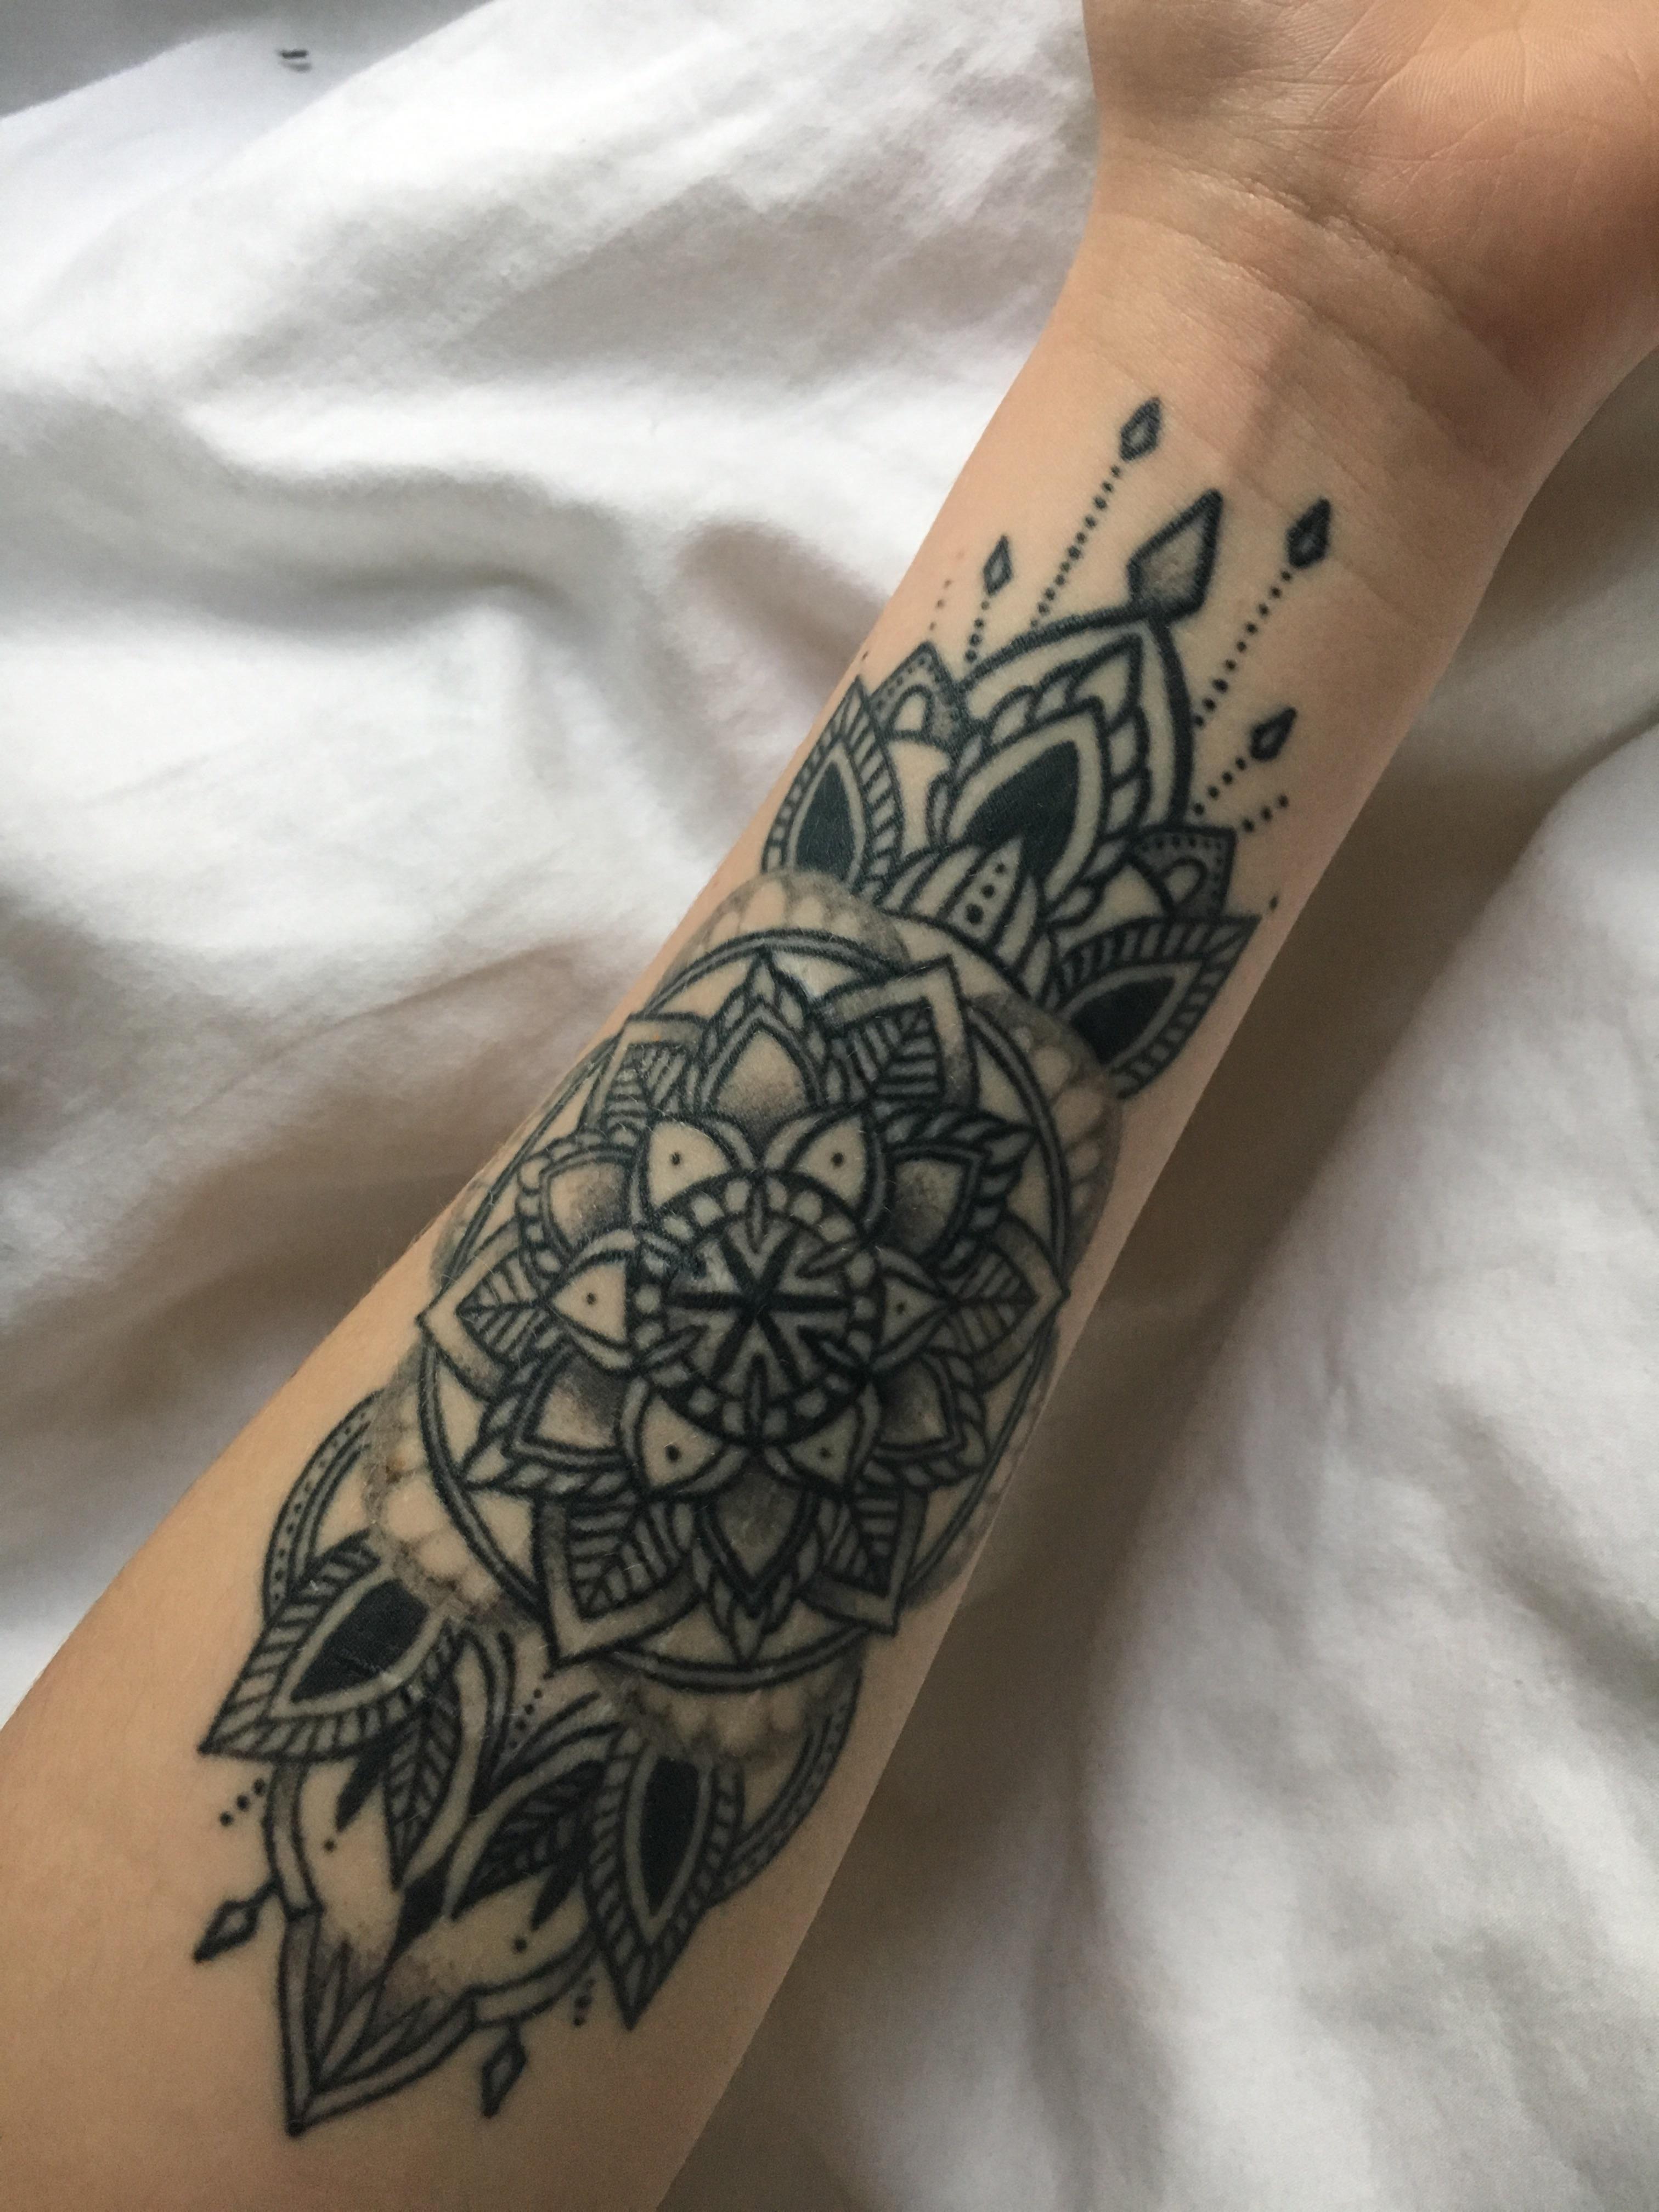 Pin on Tattoos.